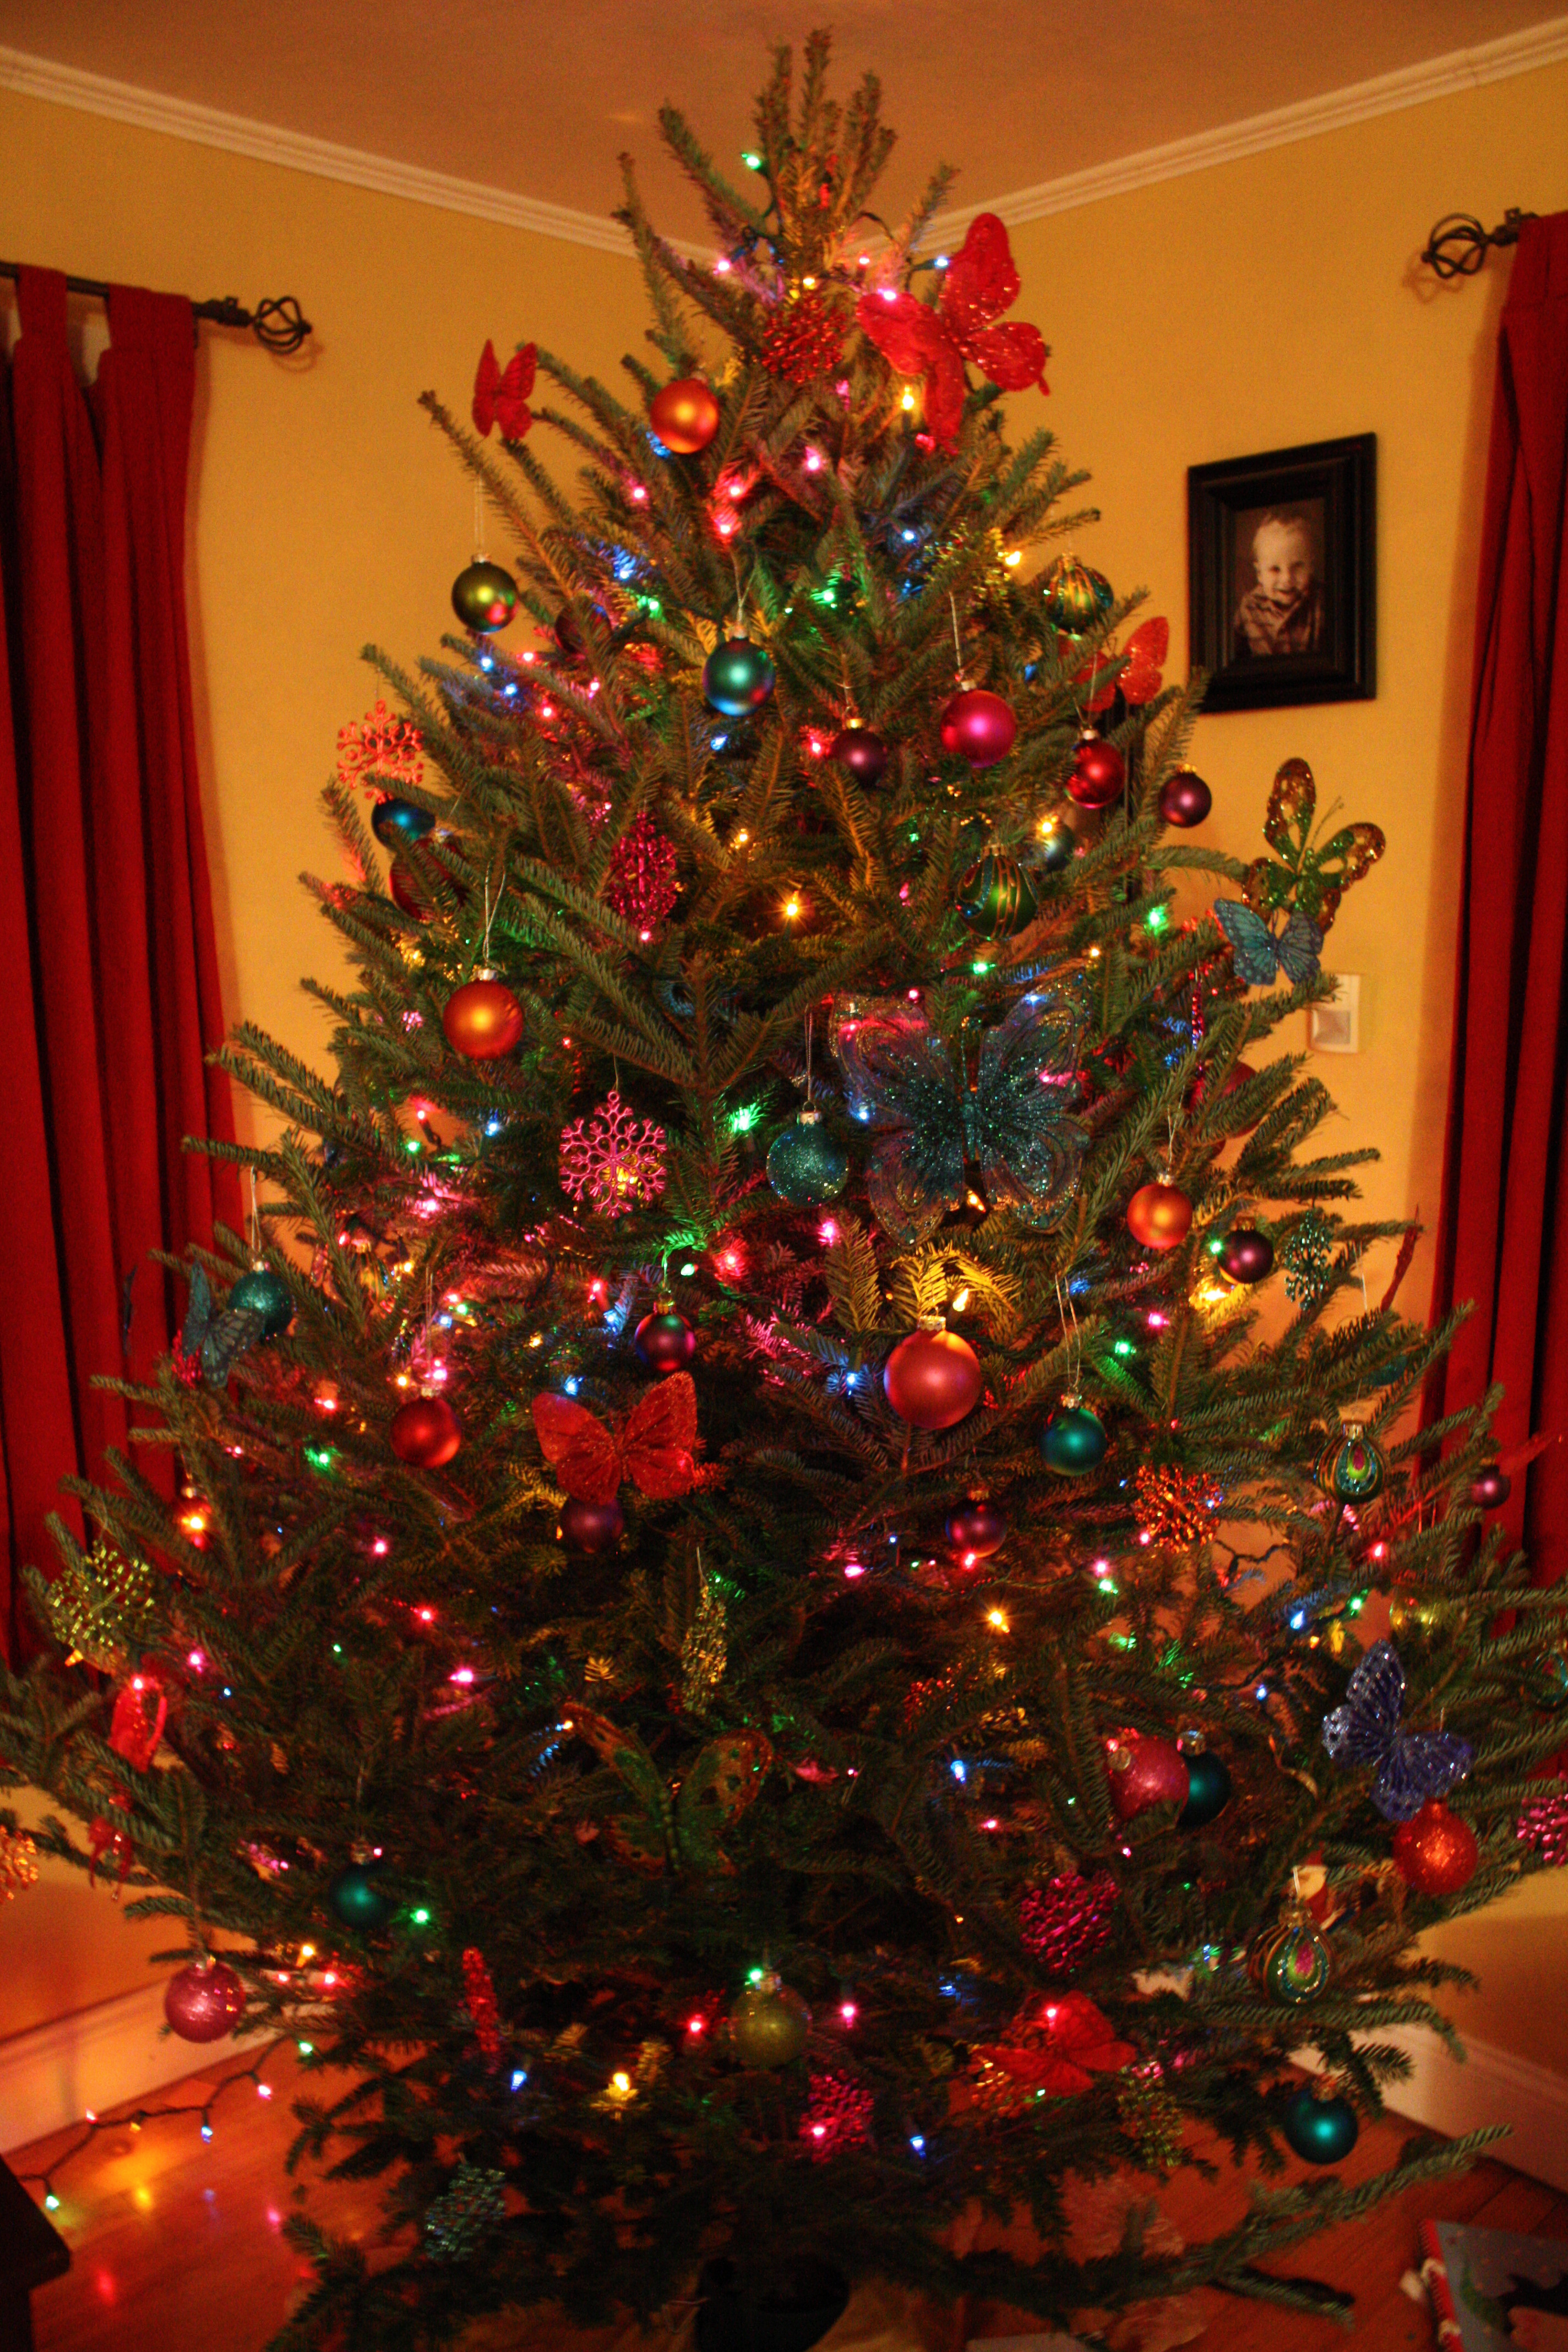 10 Elegant Christmas Tree Decorating Ideas With Multi Colored Lights multi colored christmas tree decorating ideas igrenove 2021